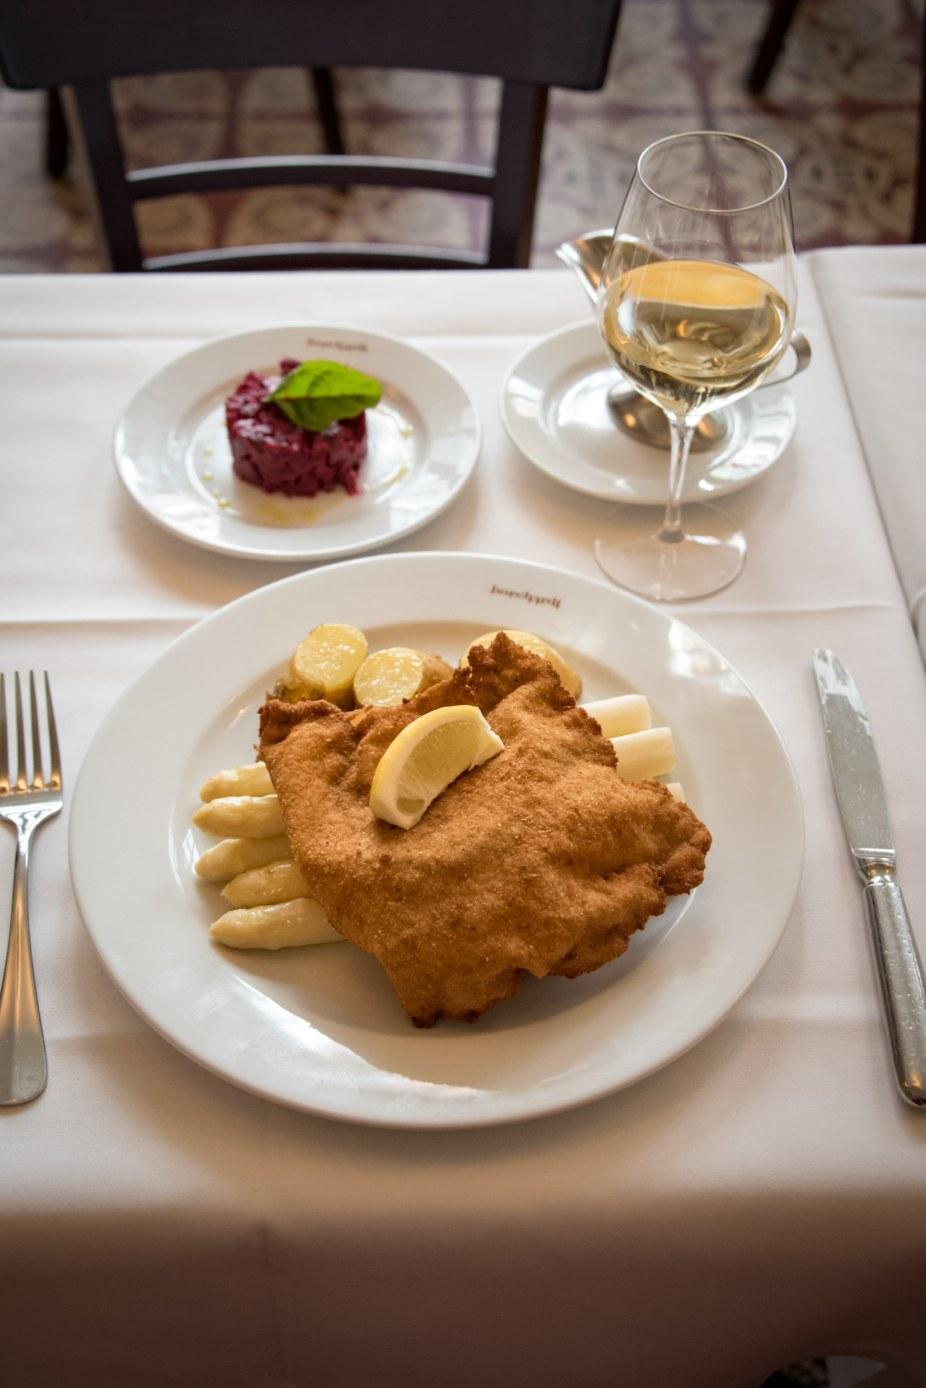 Borchardt, Ultraclassic Berlin Restaurant - The Famous Schnitzel